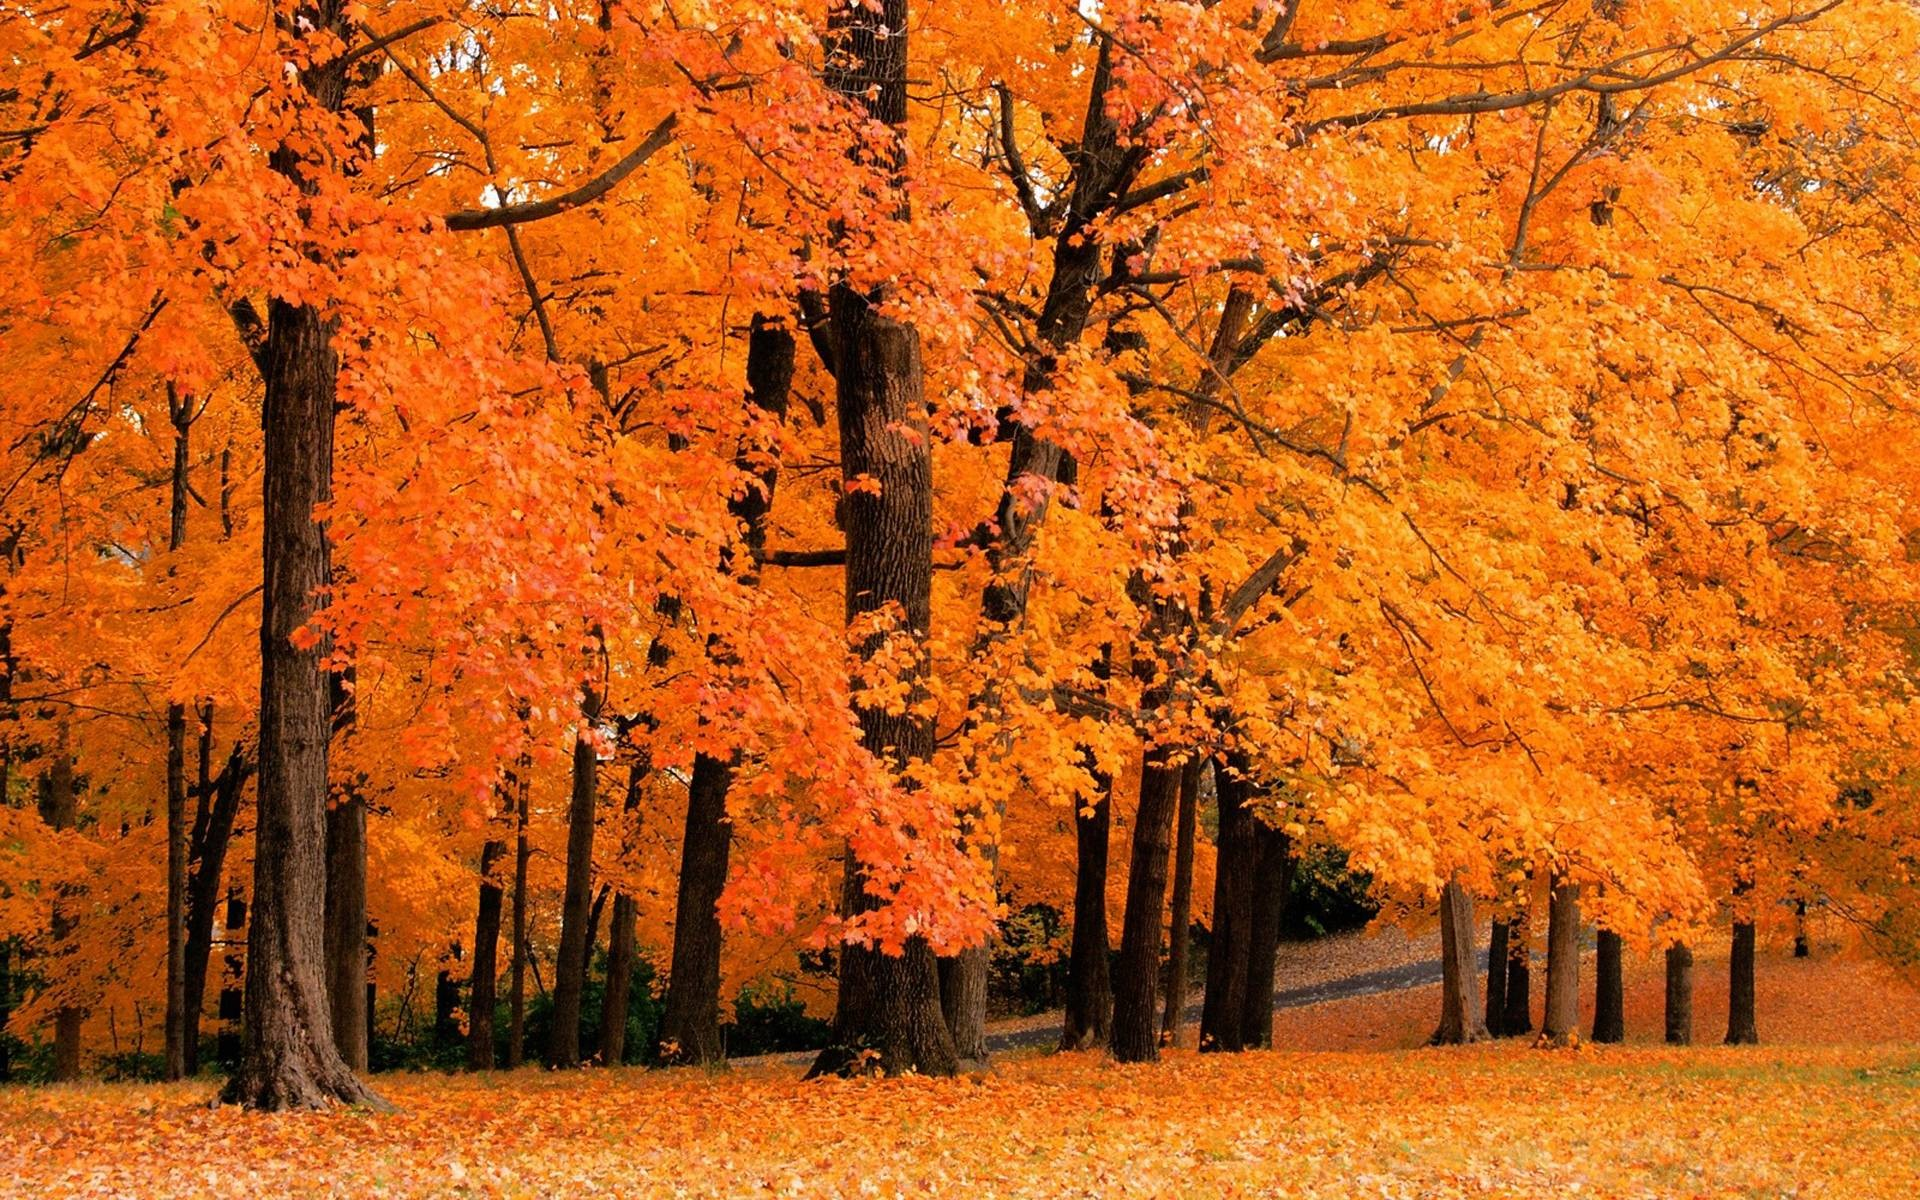 hd fall wallpaper for desktop (61+ images)